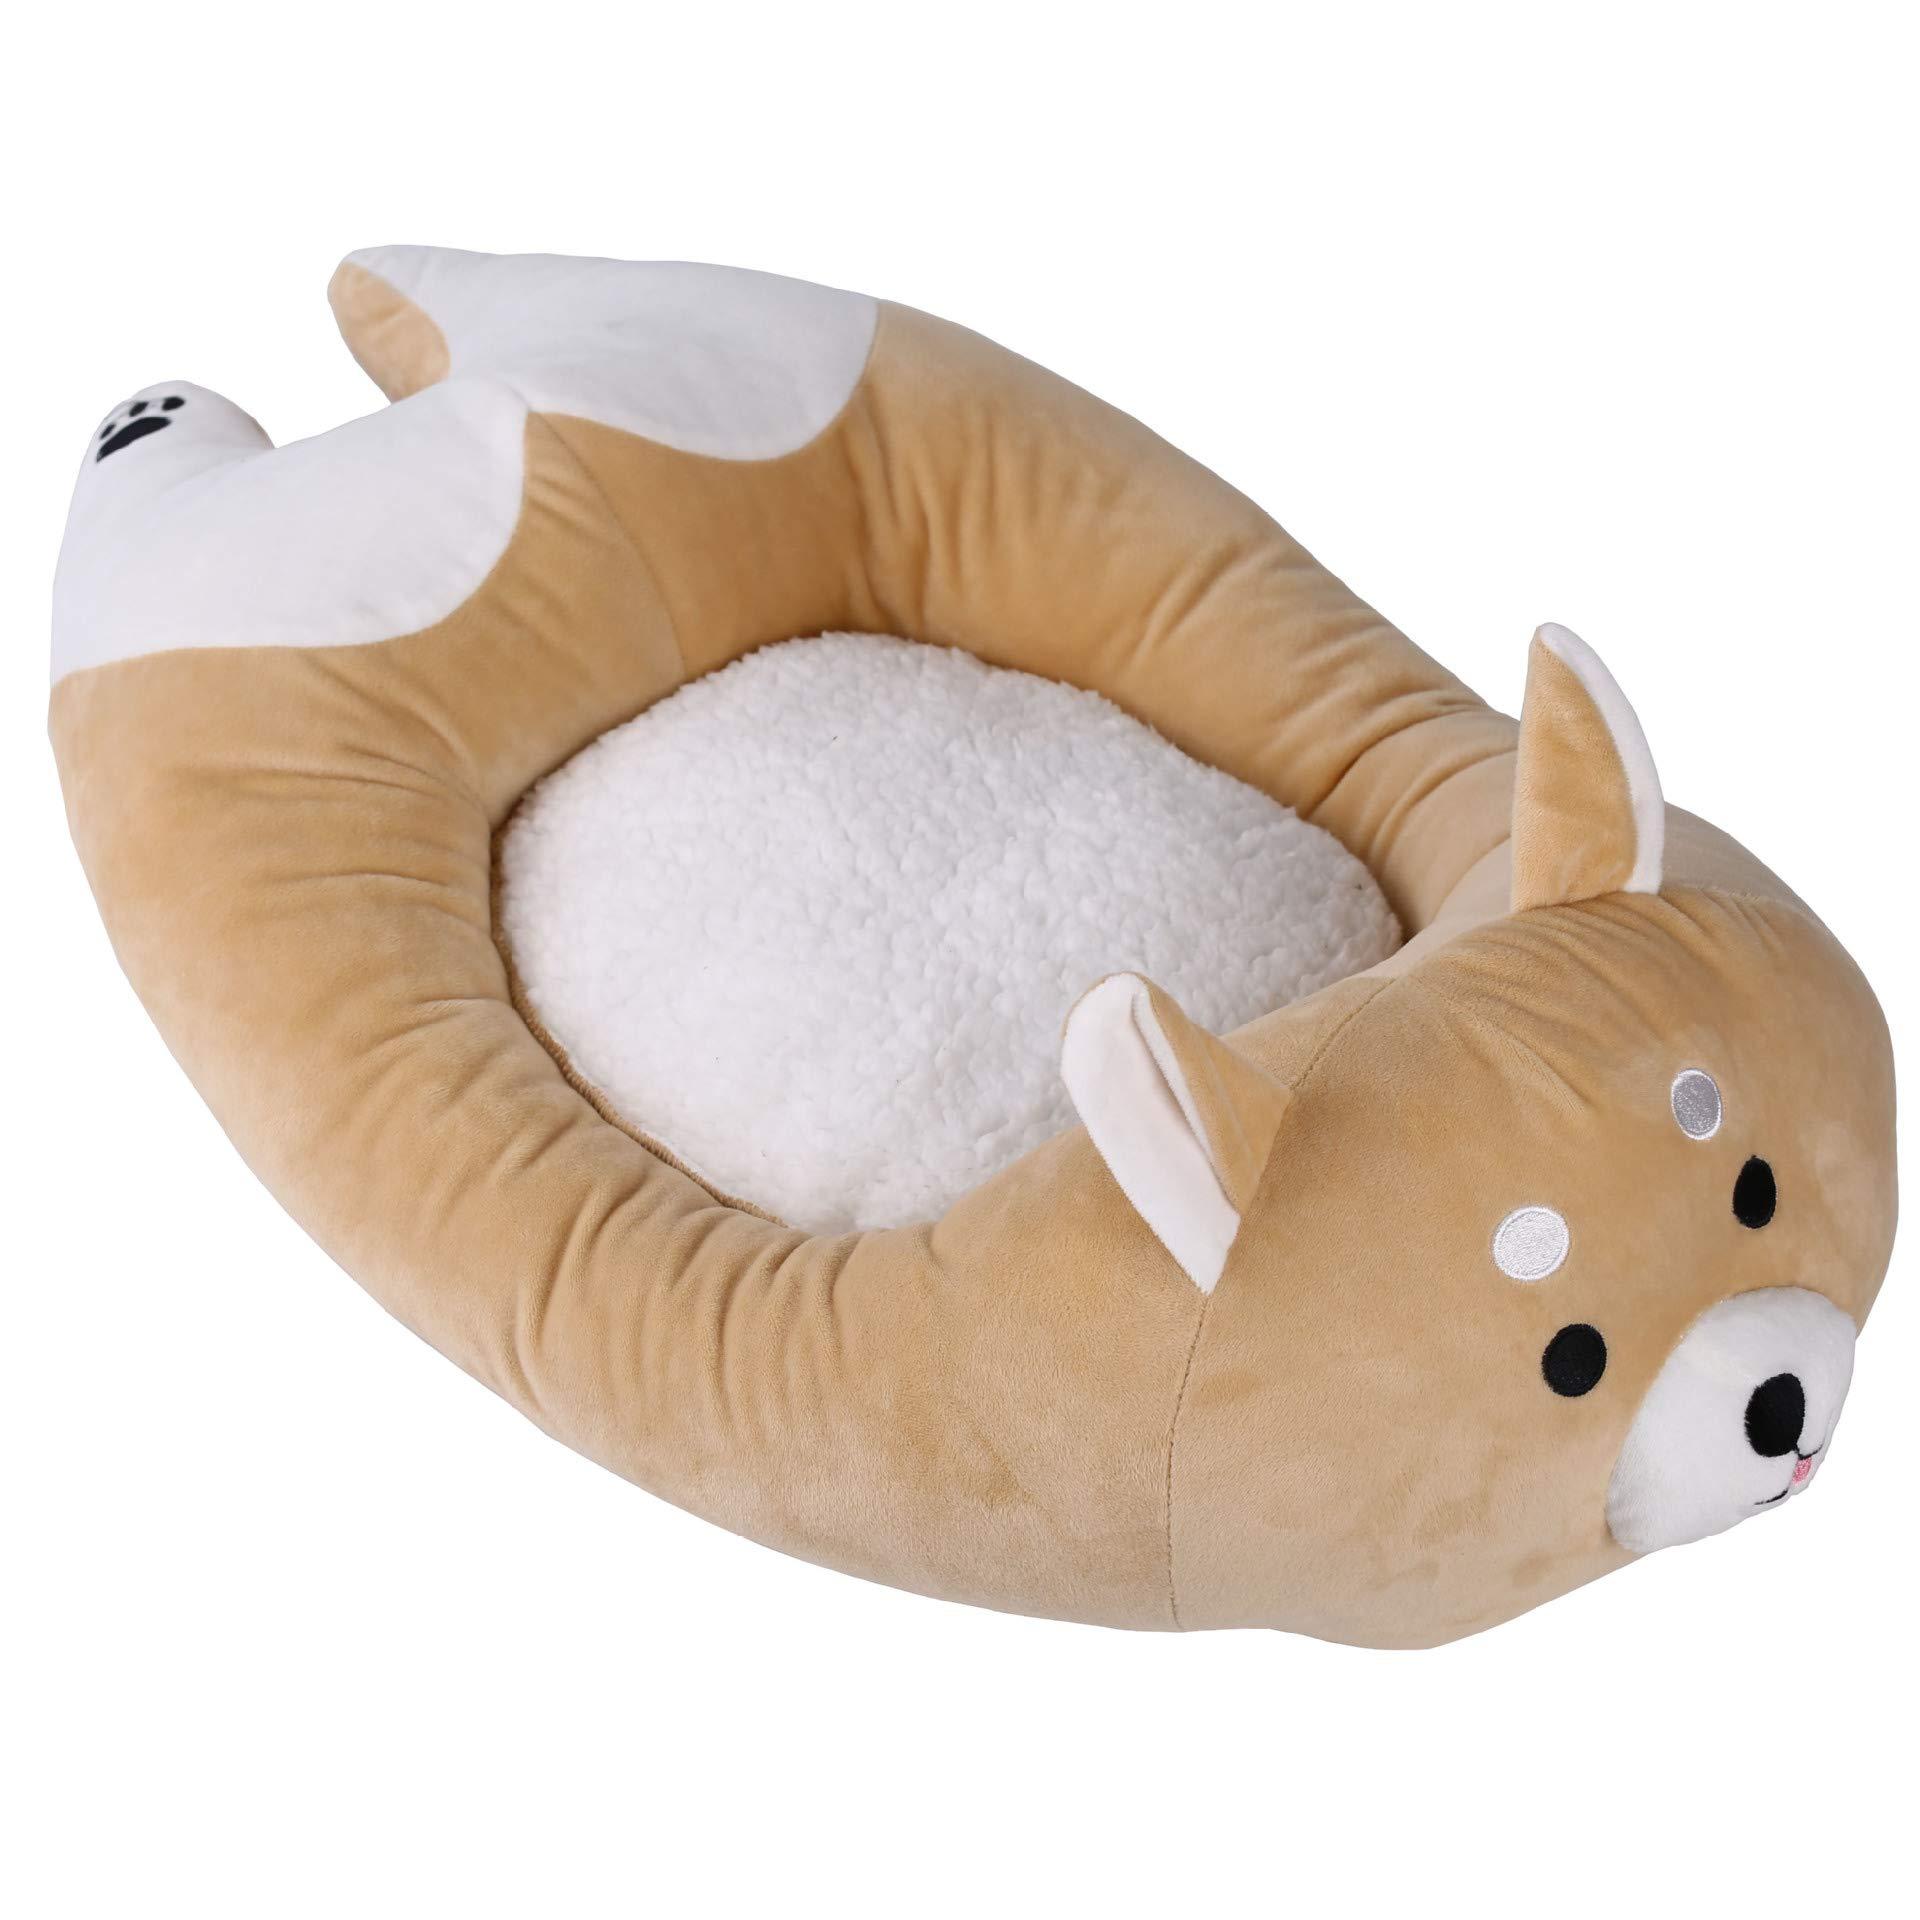 HAOHUI Shiba Inu Cartoon Cute Kennel Four Seasons Universal Cat Litter Pet Bed Pet Supplies28.74X15.74X3.14Inch